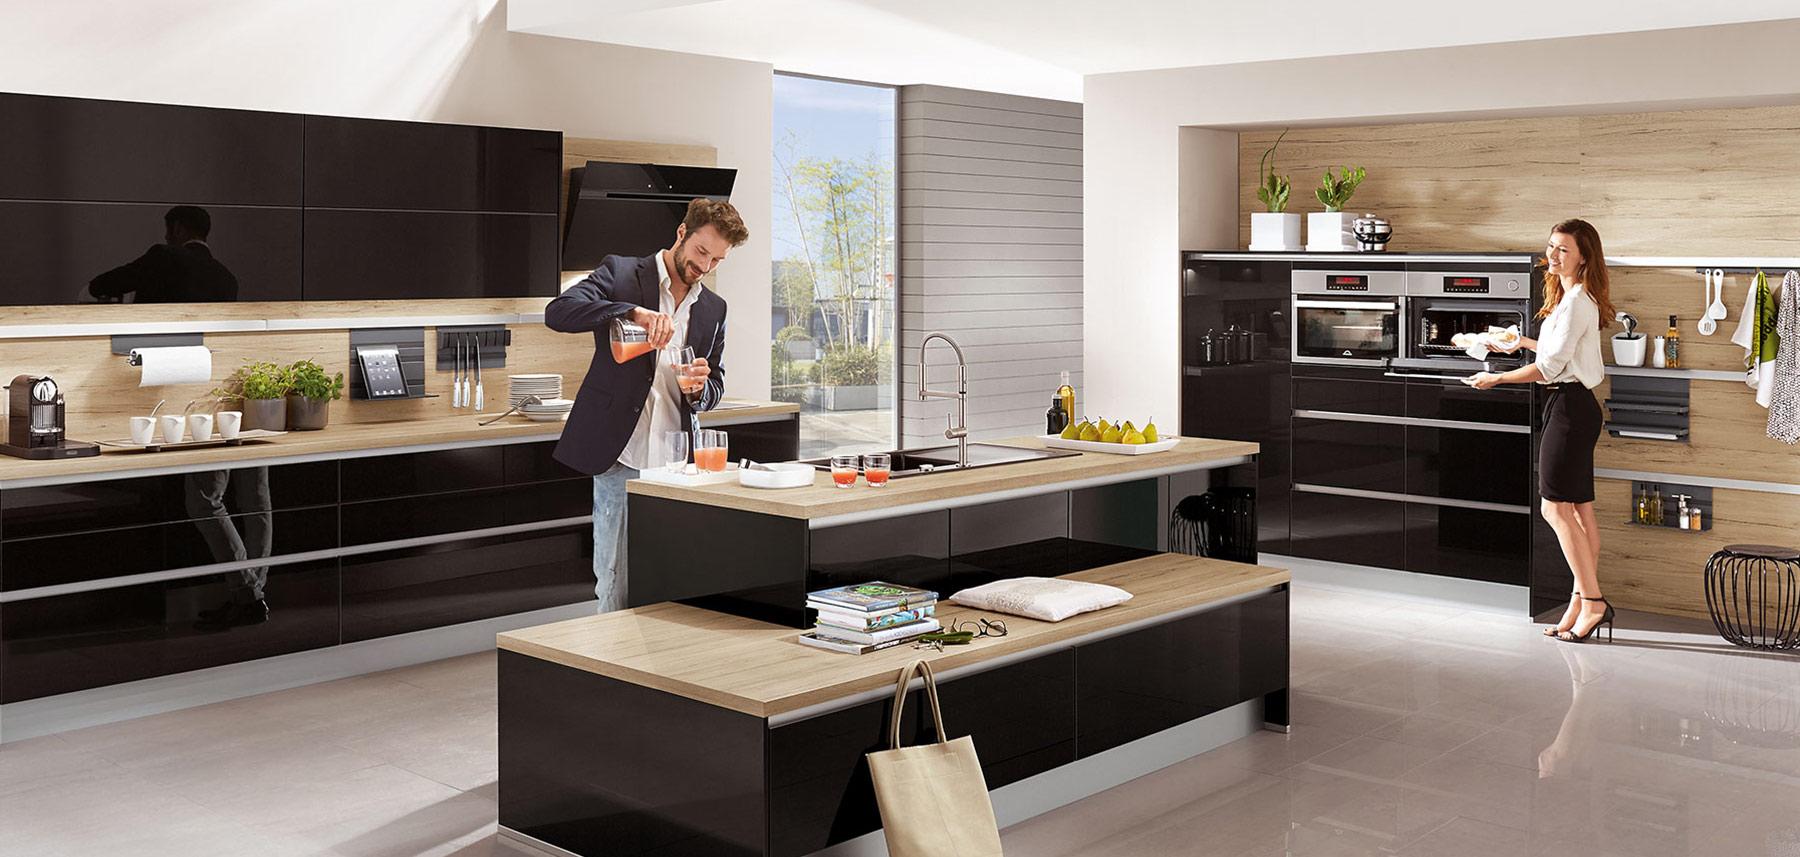 Dekor Haus Nobilia German Kitchens